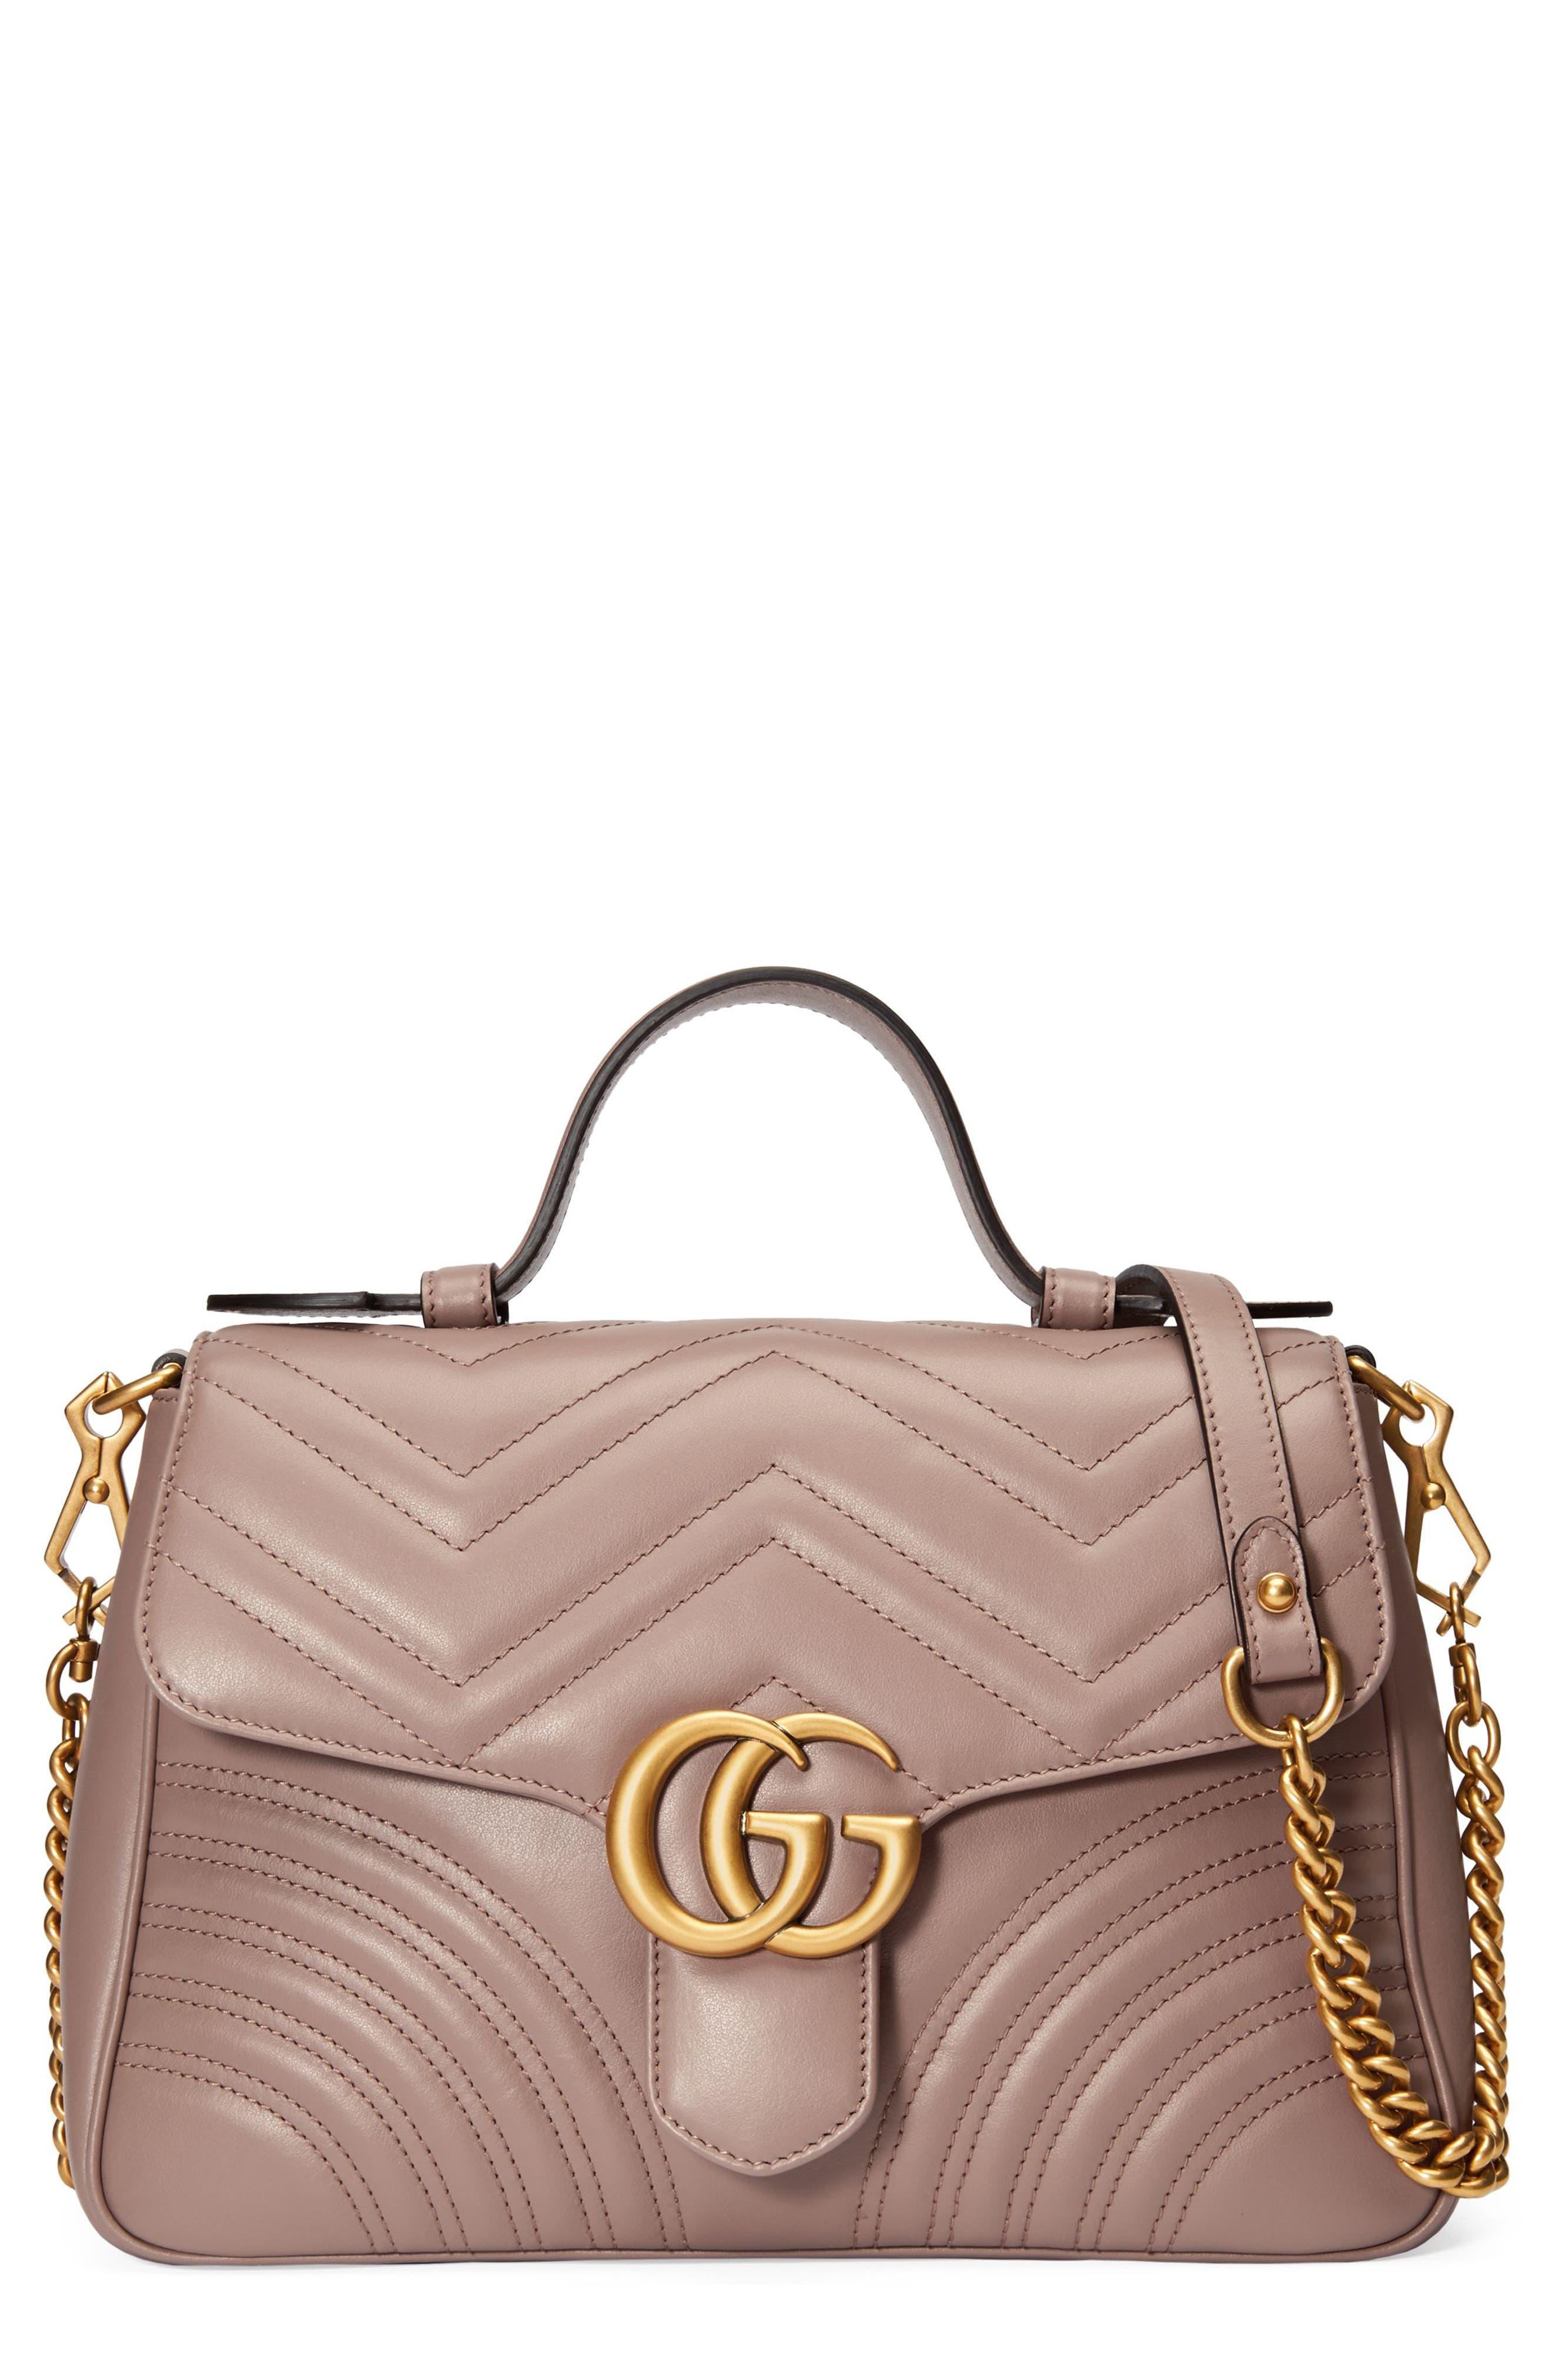 Gucci Small GG Marmont 2.0 Matelassé Leather Top Handle Bag